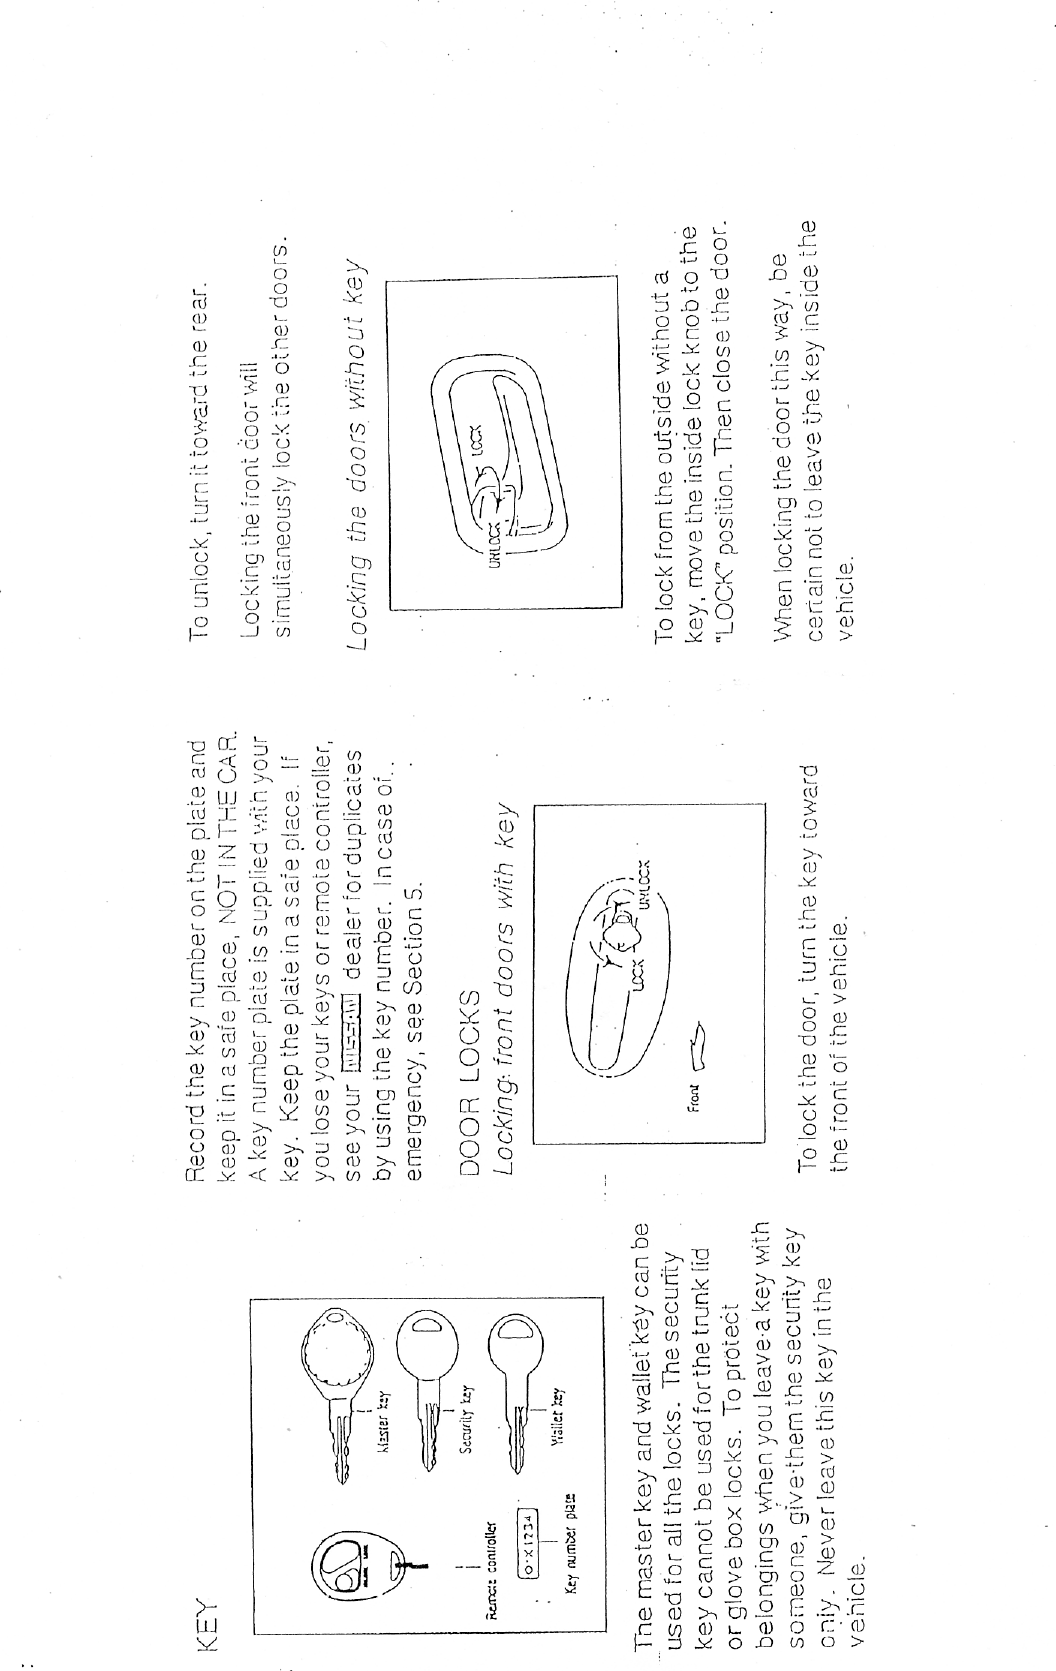 calsonic kansei msub13 keyless entry transmitter user manual manual rh usermanual wiki